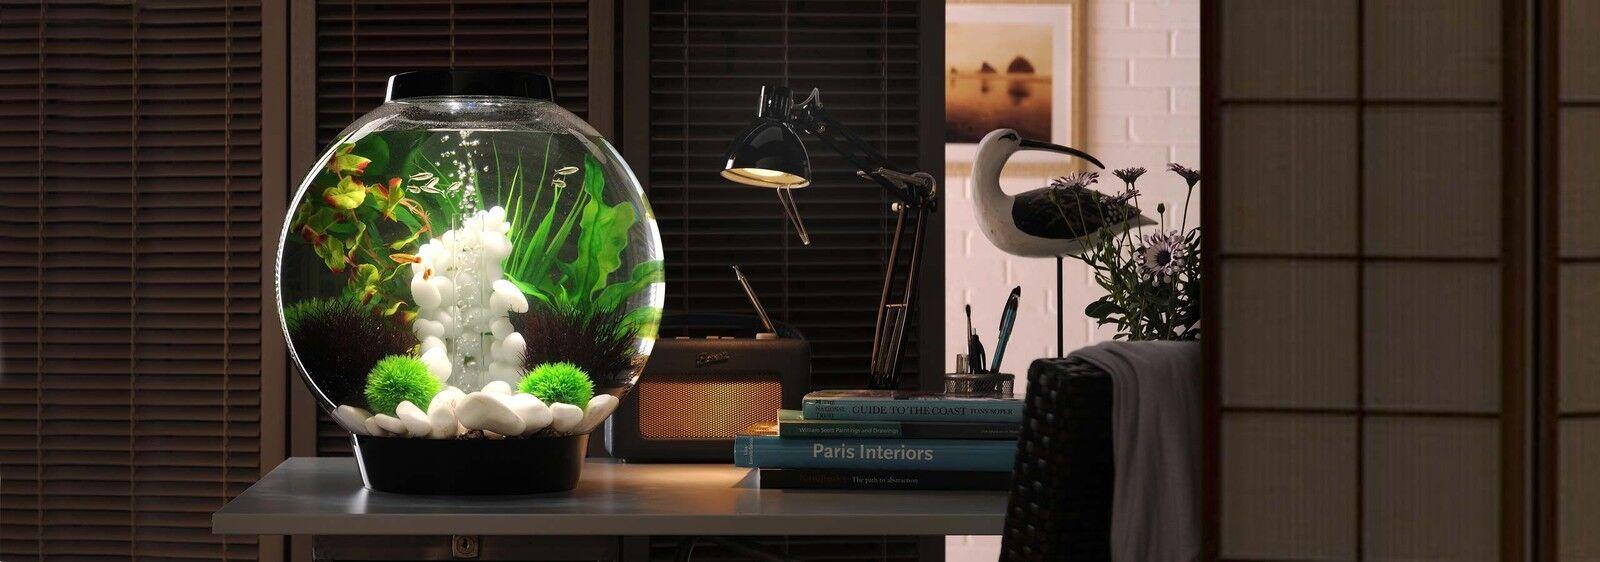 Fishcare Pro